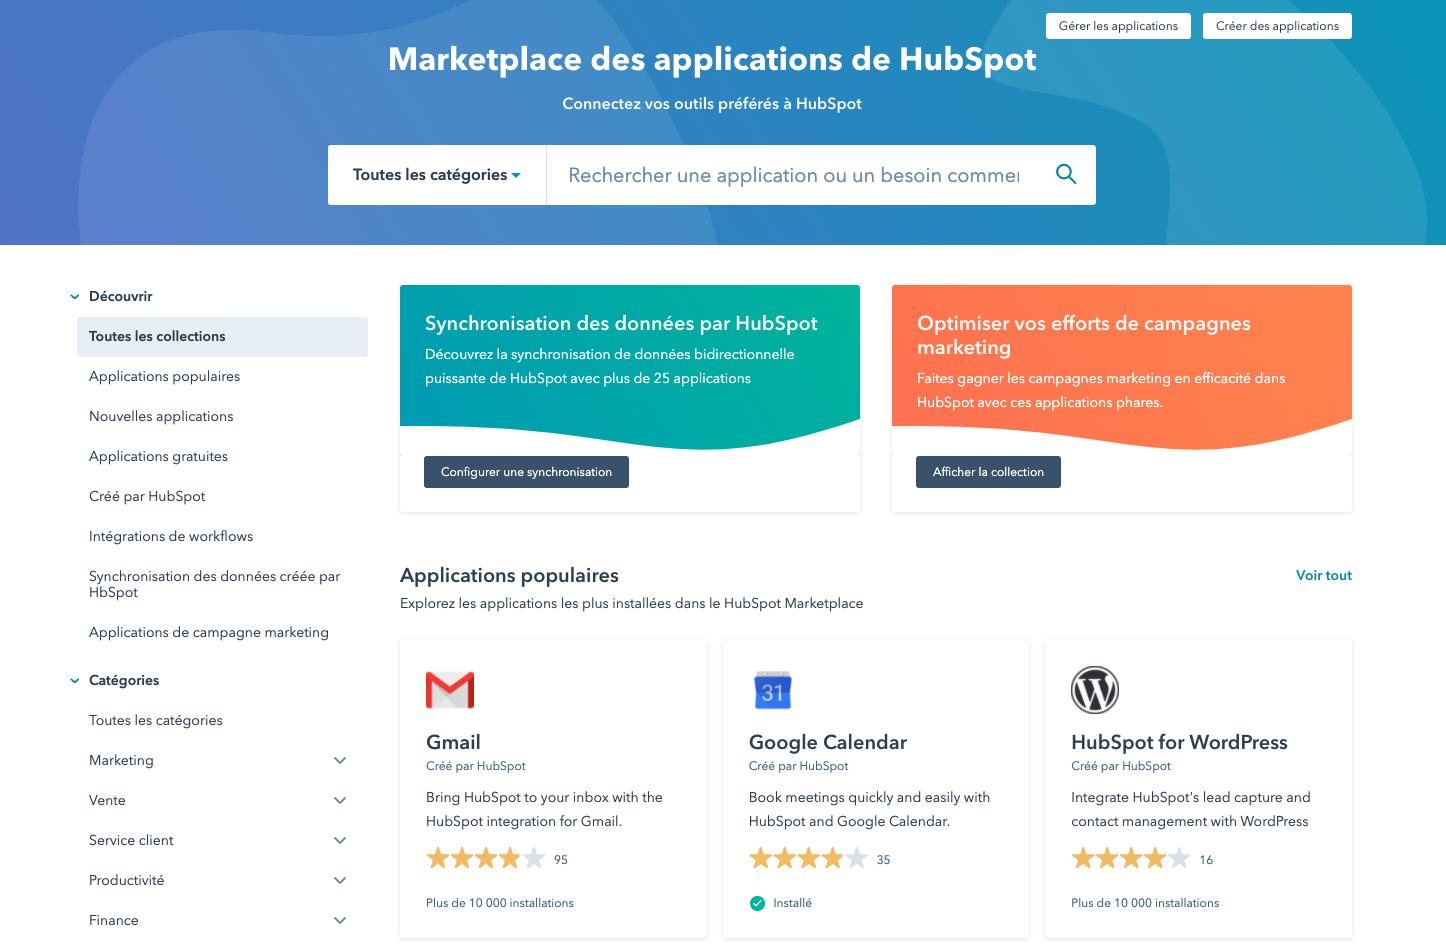 HubSpot - Marketplace